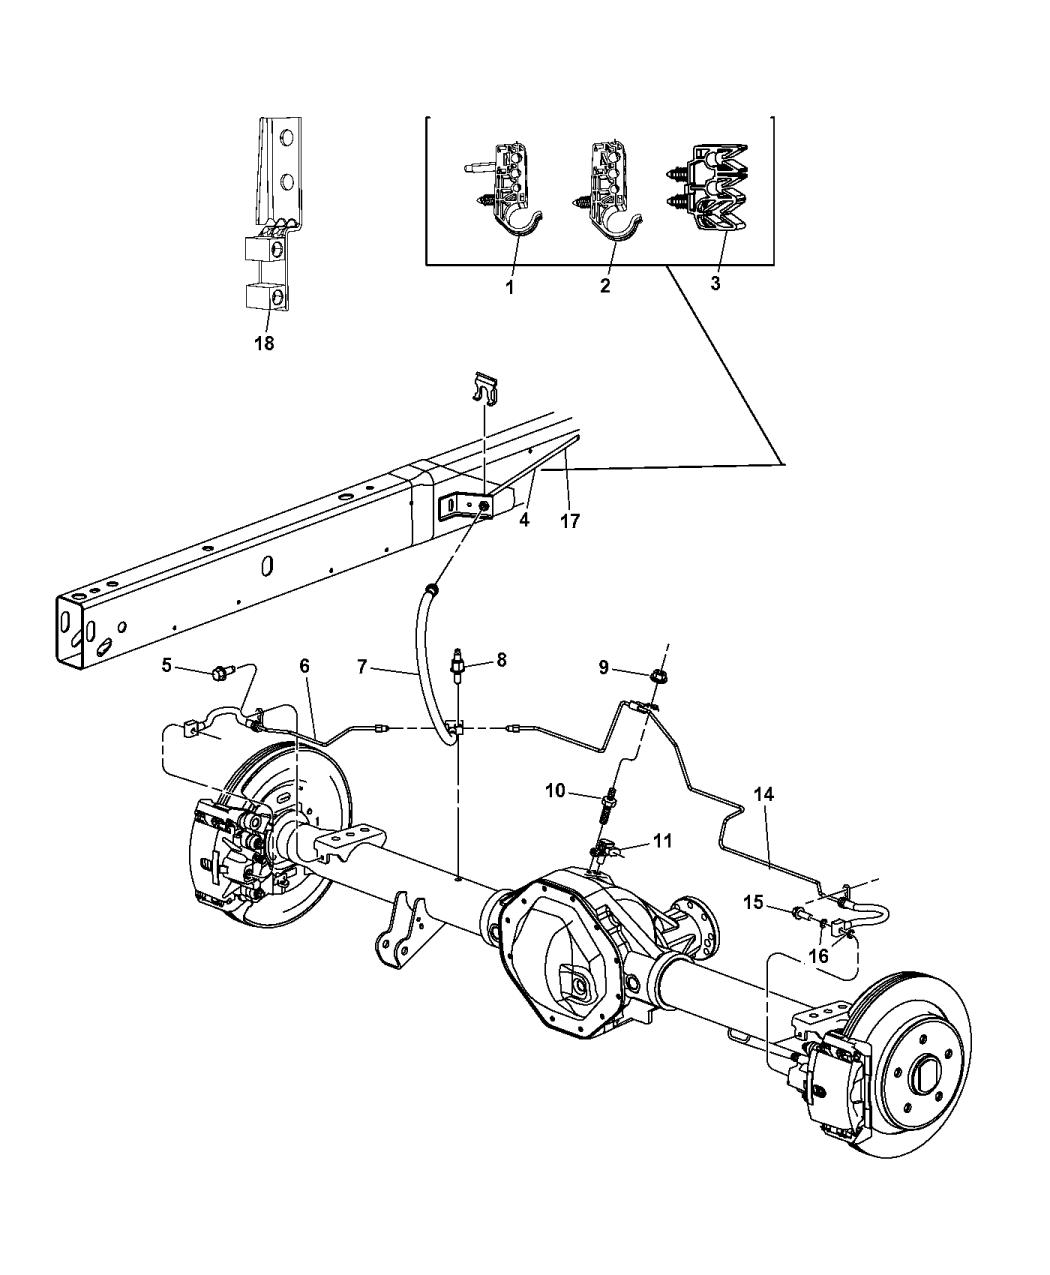 68248397AB - Genuine Ram CLIP-ABS SENSOR WIRING